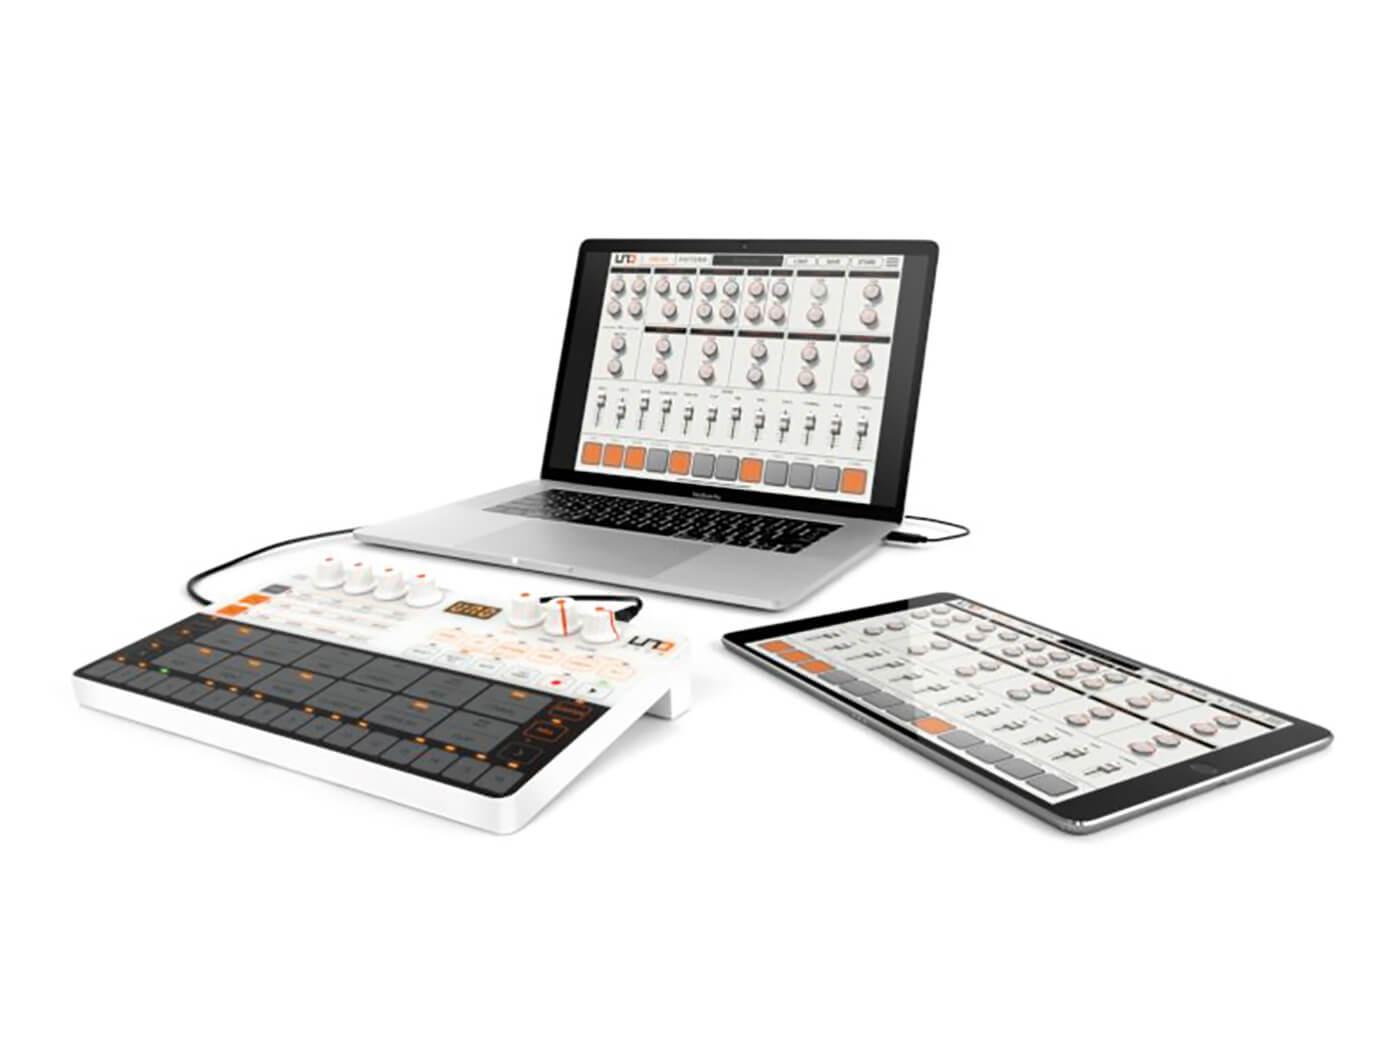 IK Multimedia UNO Drum Editor